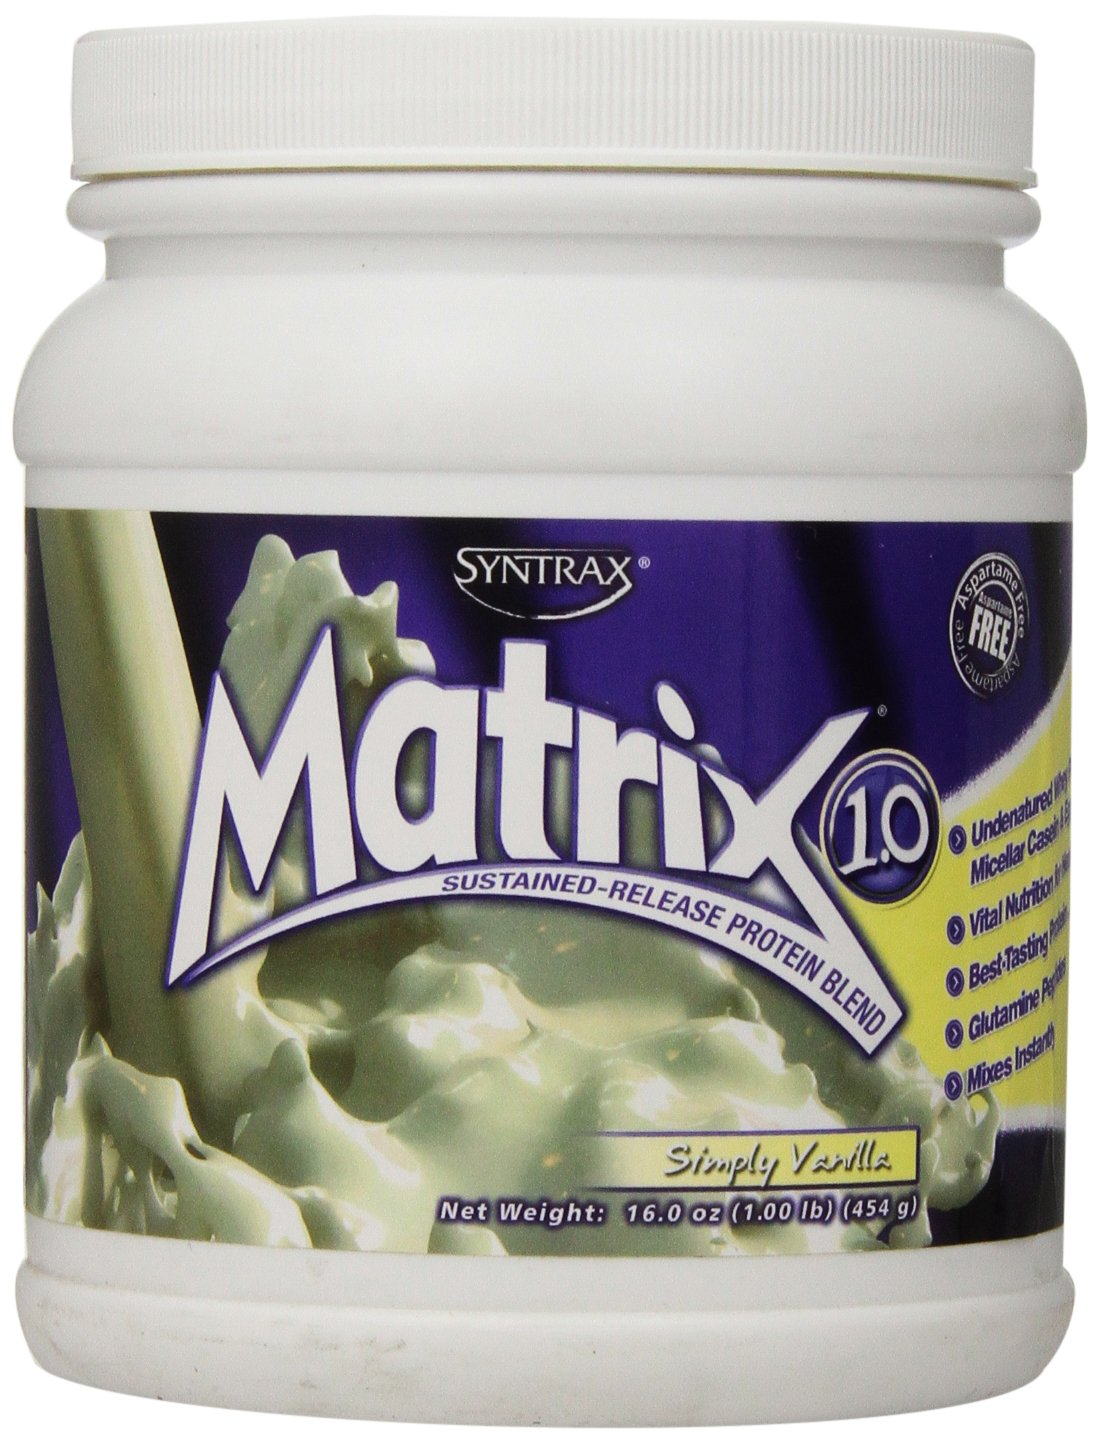 Syntrax Matrix Whey Protein, by Simply Vanilla, 1 Pound B00MGCK8C0 by Whey Syntrax B00MGCK8C0, izumiジュエリーシマノ:518ccc81 --- dakuwebsite.xyz